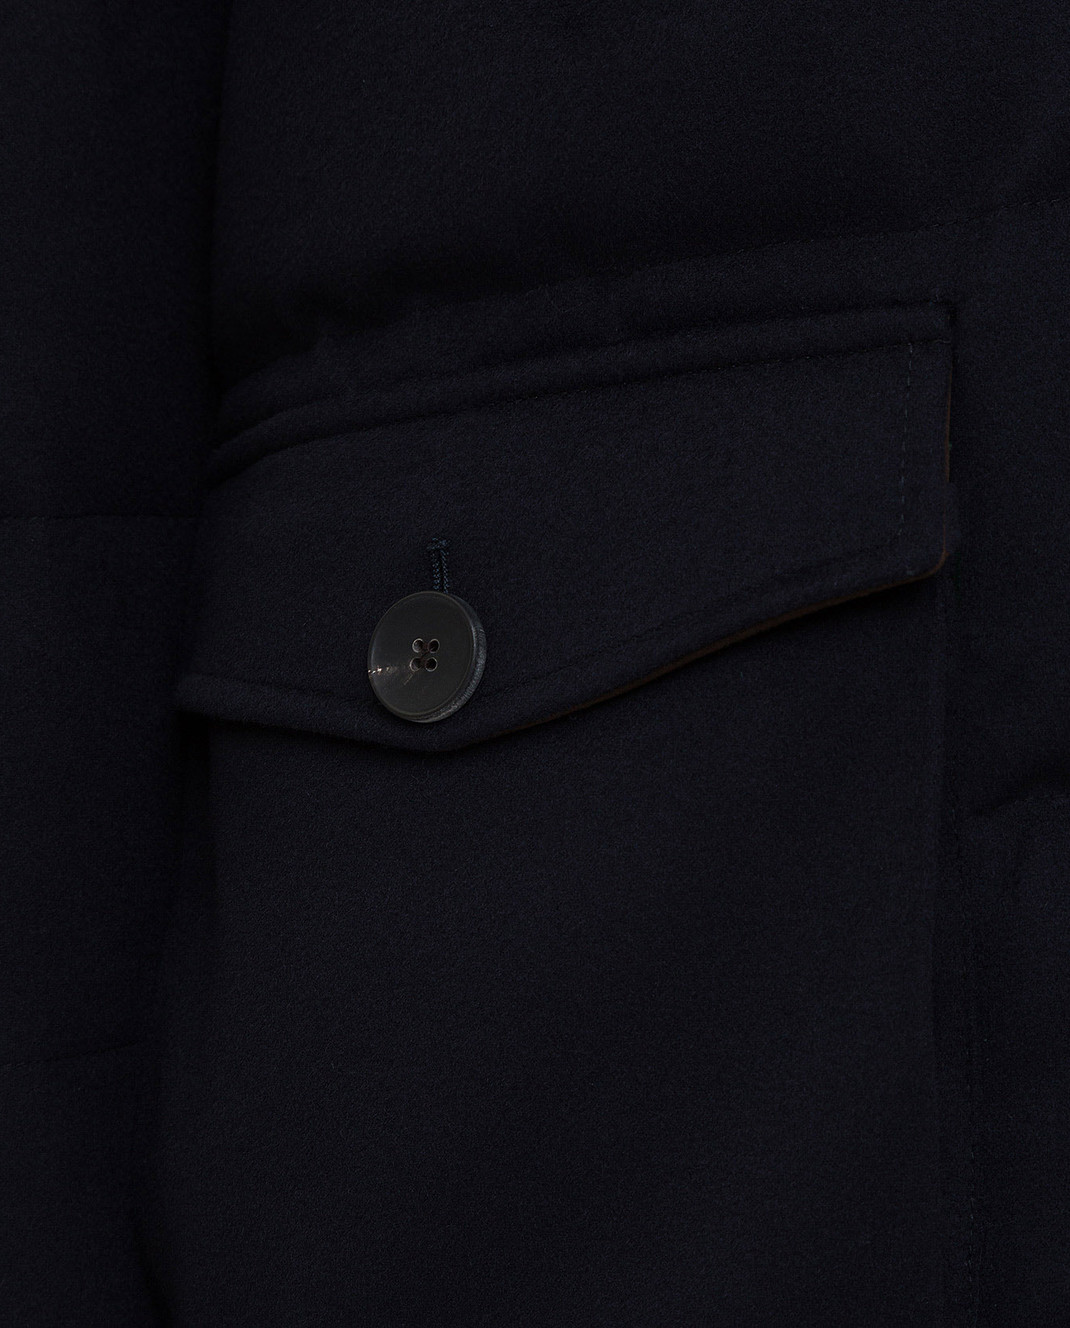 Heresis Темно-синий пуховик из шерсти с мехом енота PARKASTORMLANAVISCOSA изображение 5